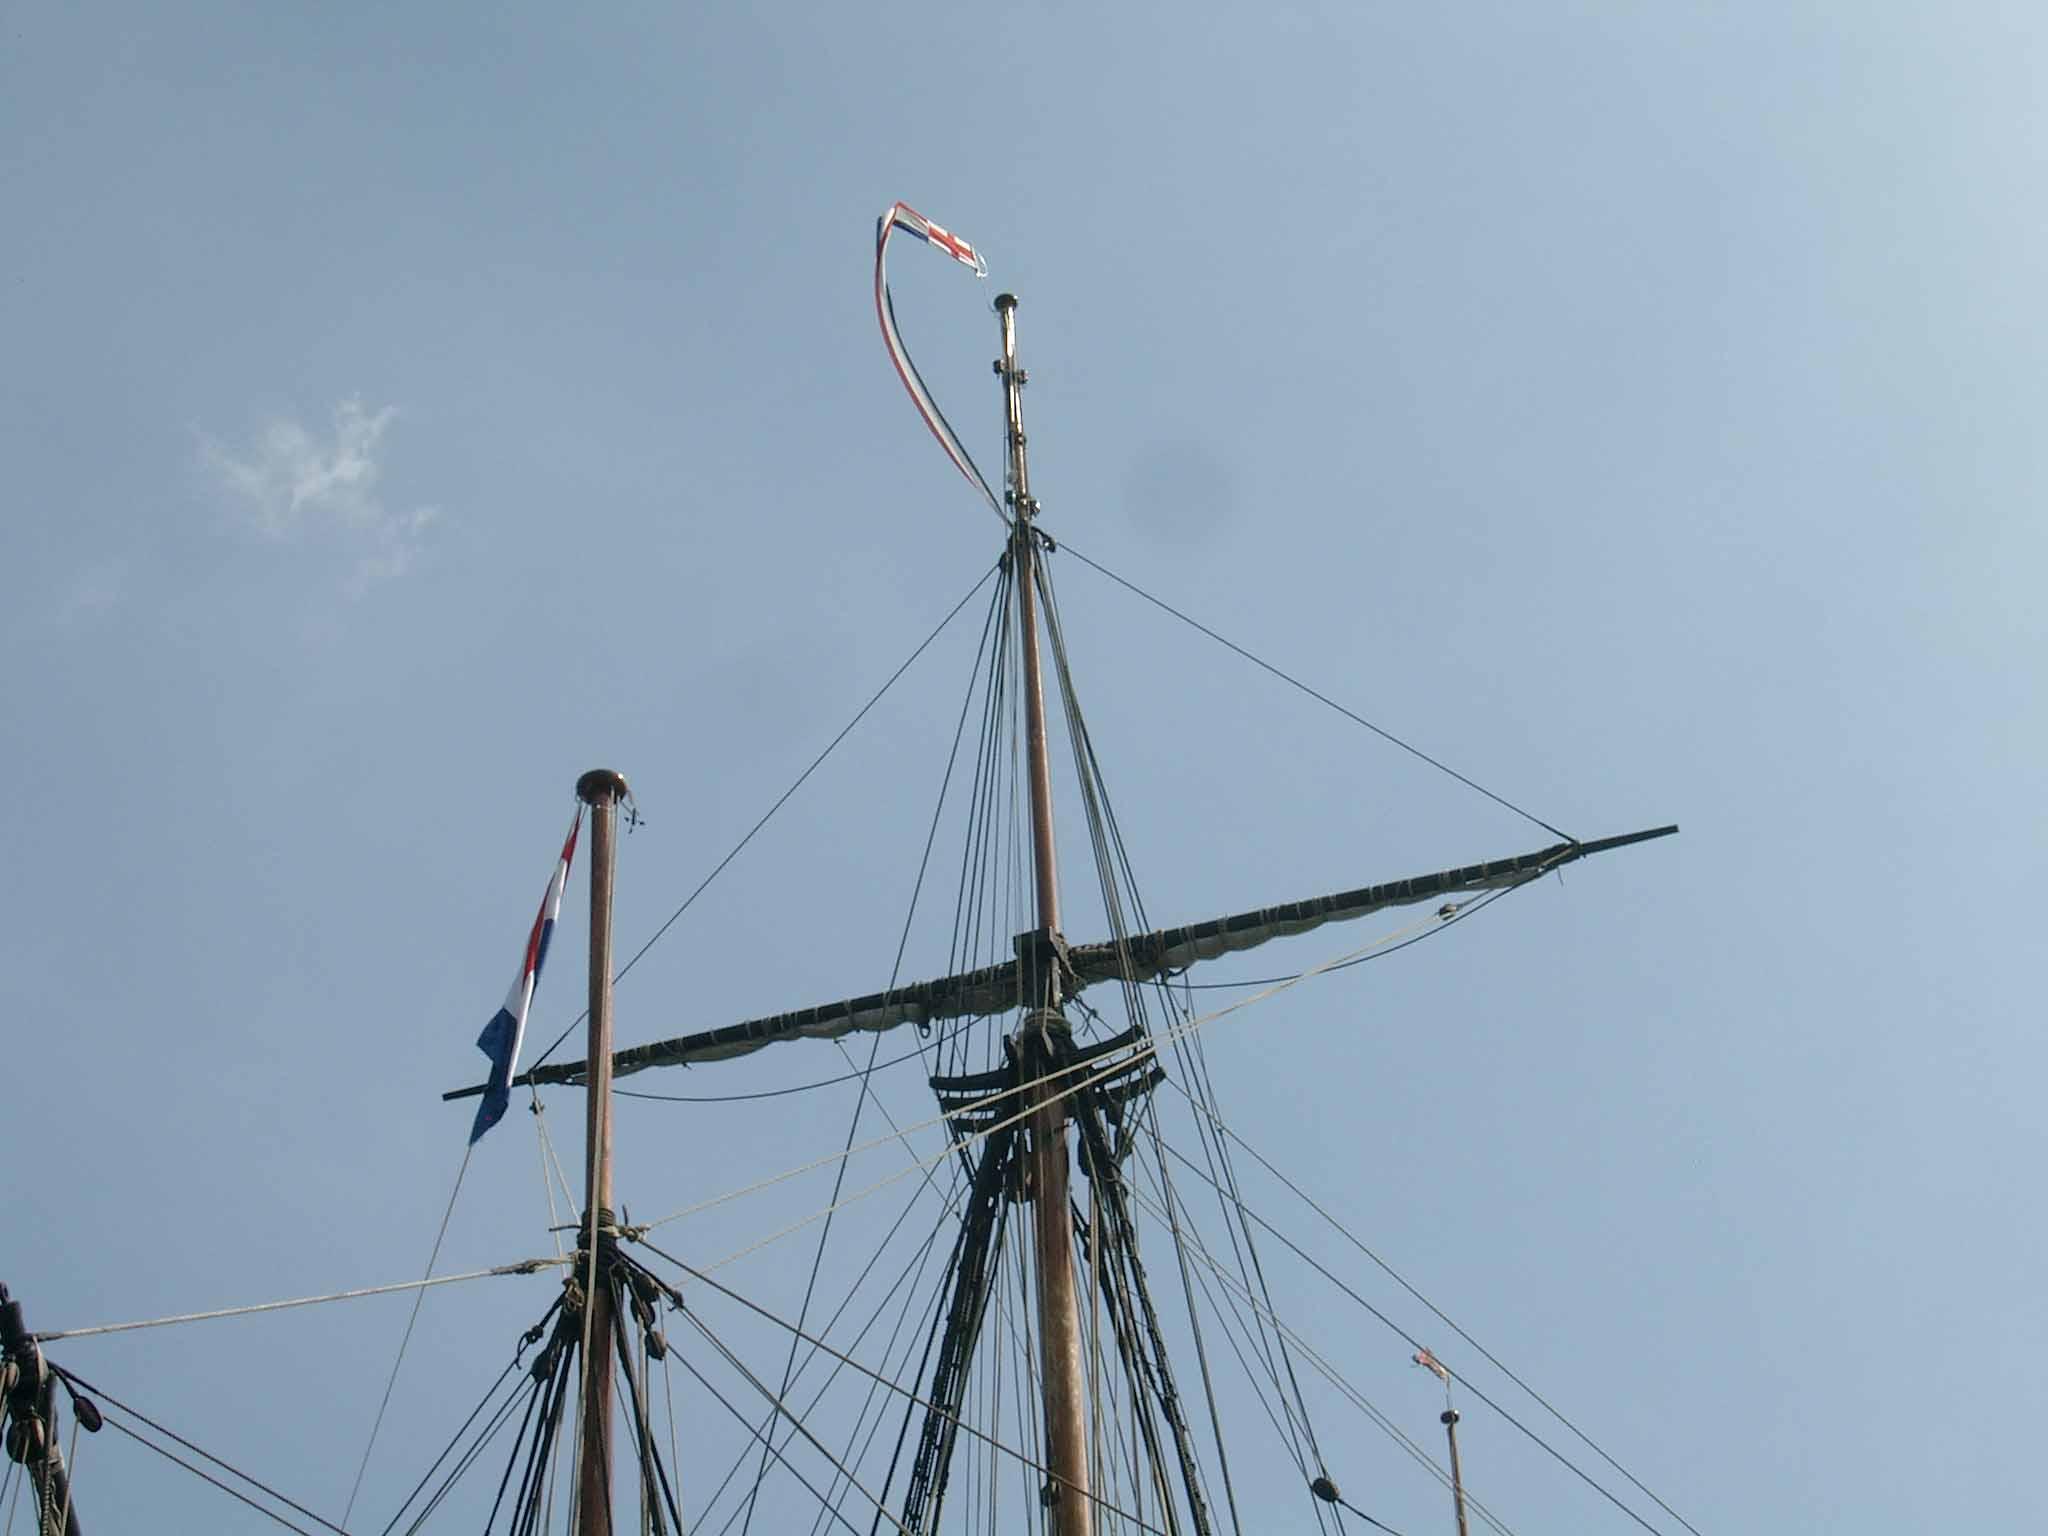 Photos Of Replica Of HM Bark Endeavour Of James Cook